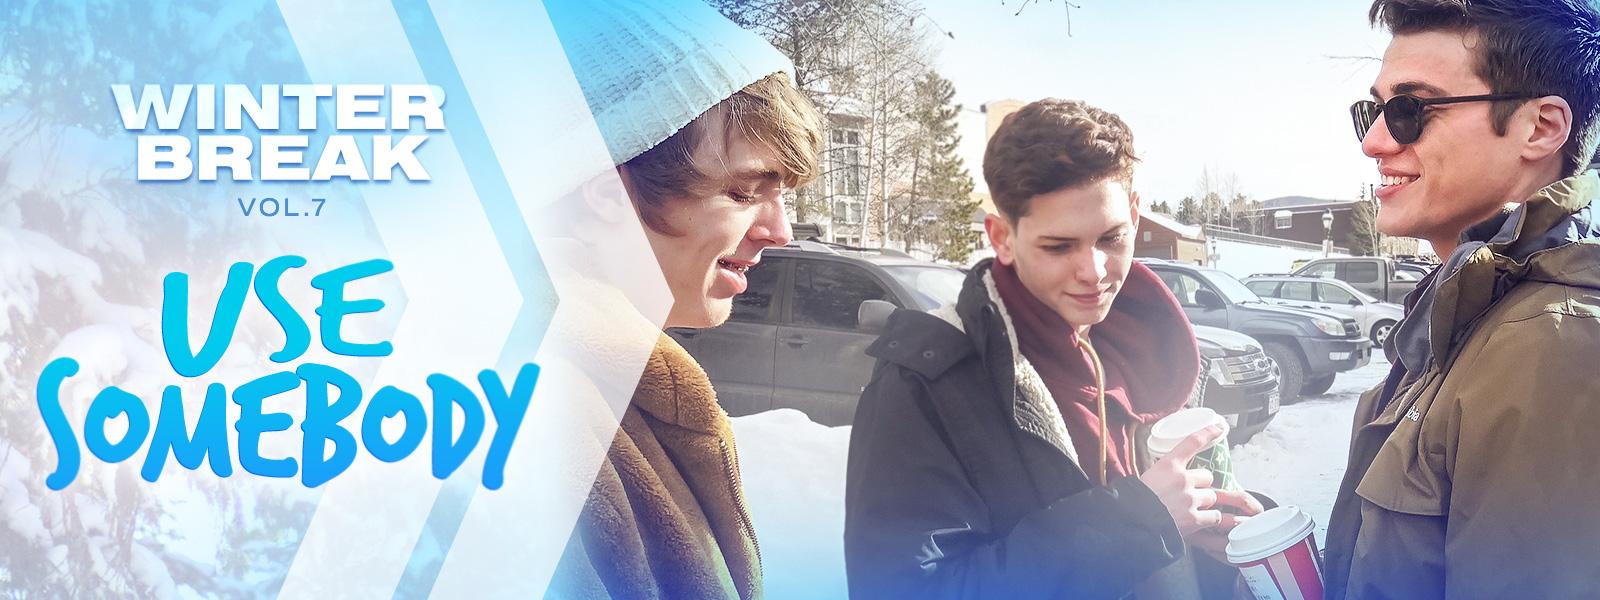 Winter Break vol. 7: Use Somebody